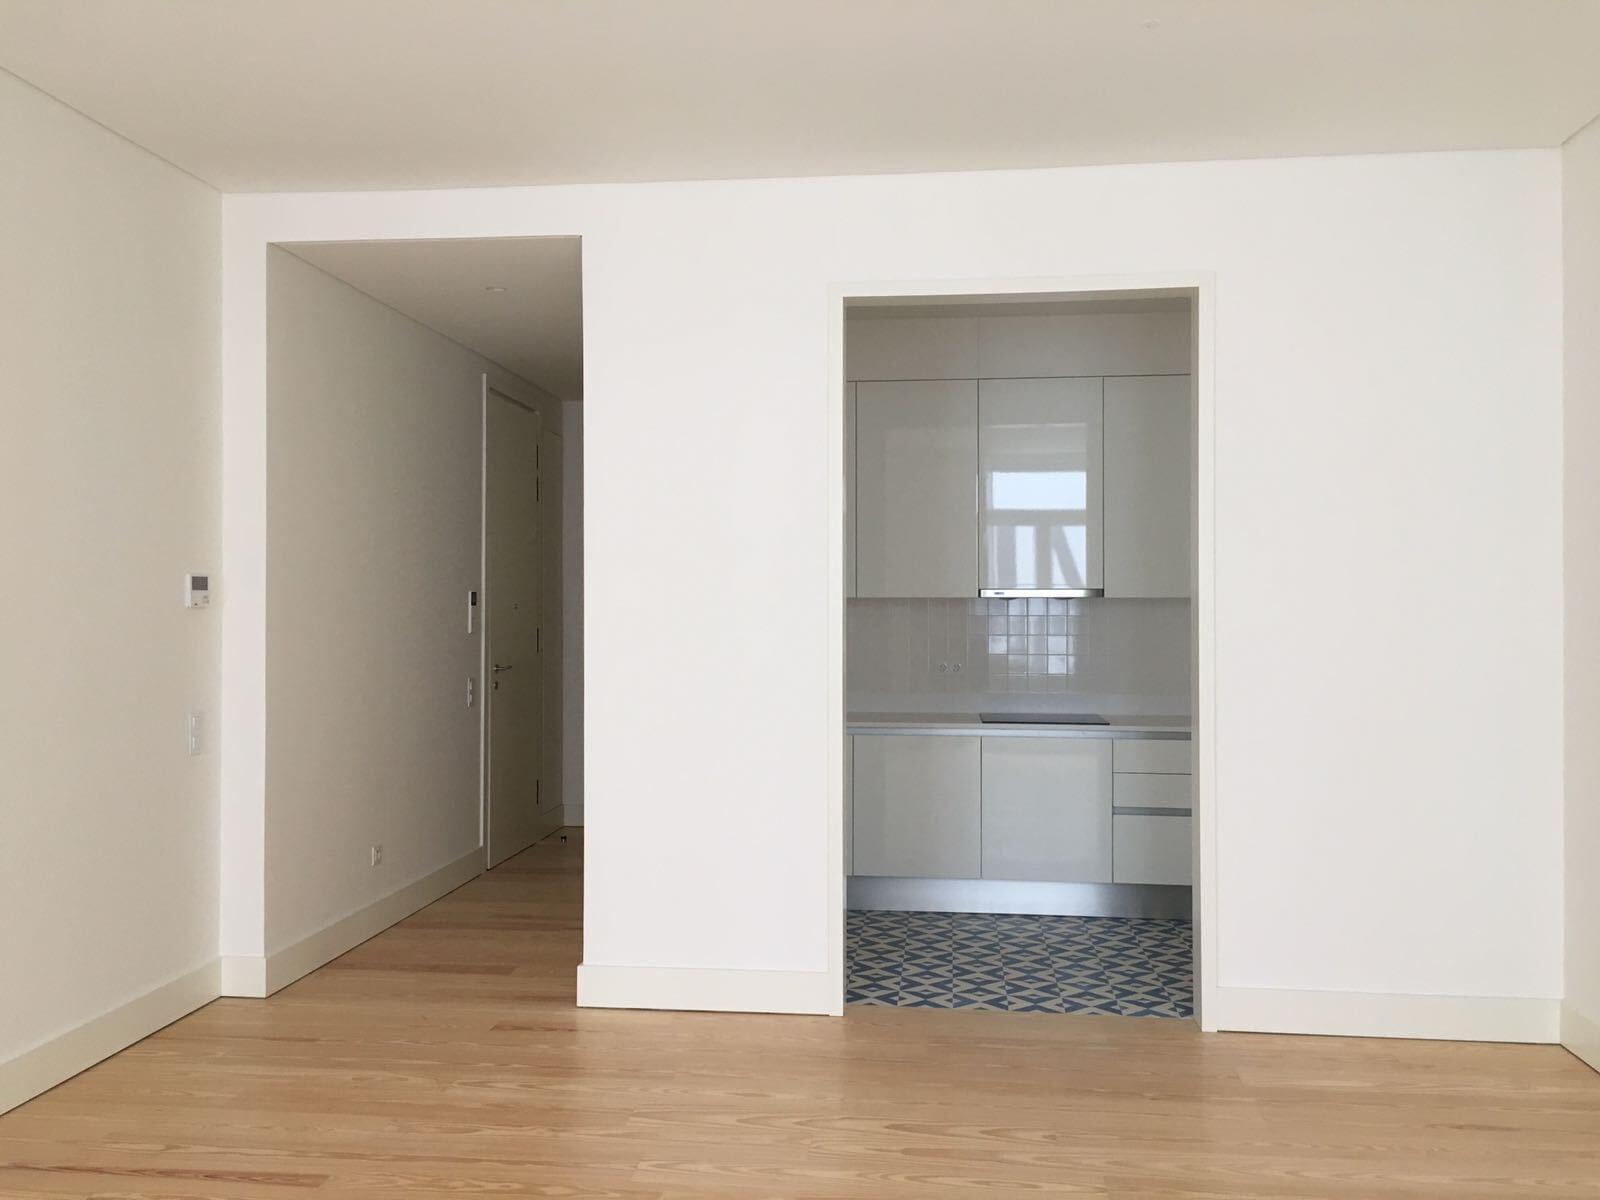 pf17142-apartamento-t2-lisboa-47023442-af07-474b-9598-53353f6970ef